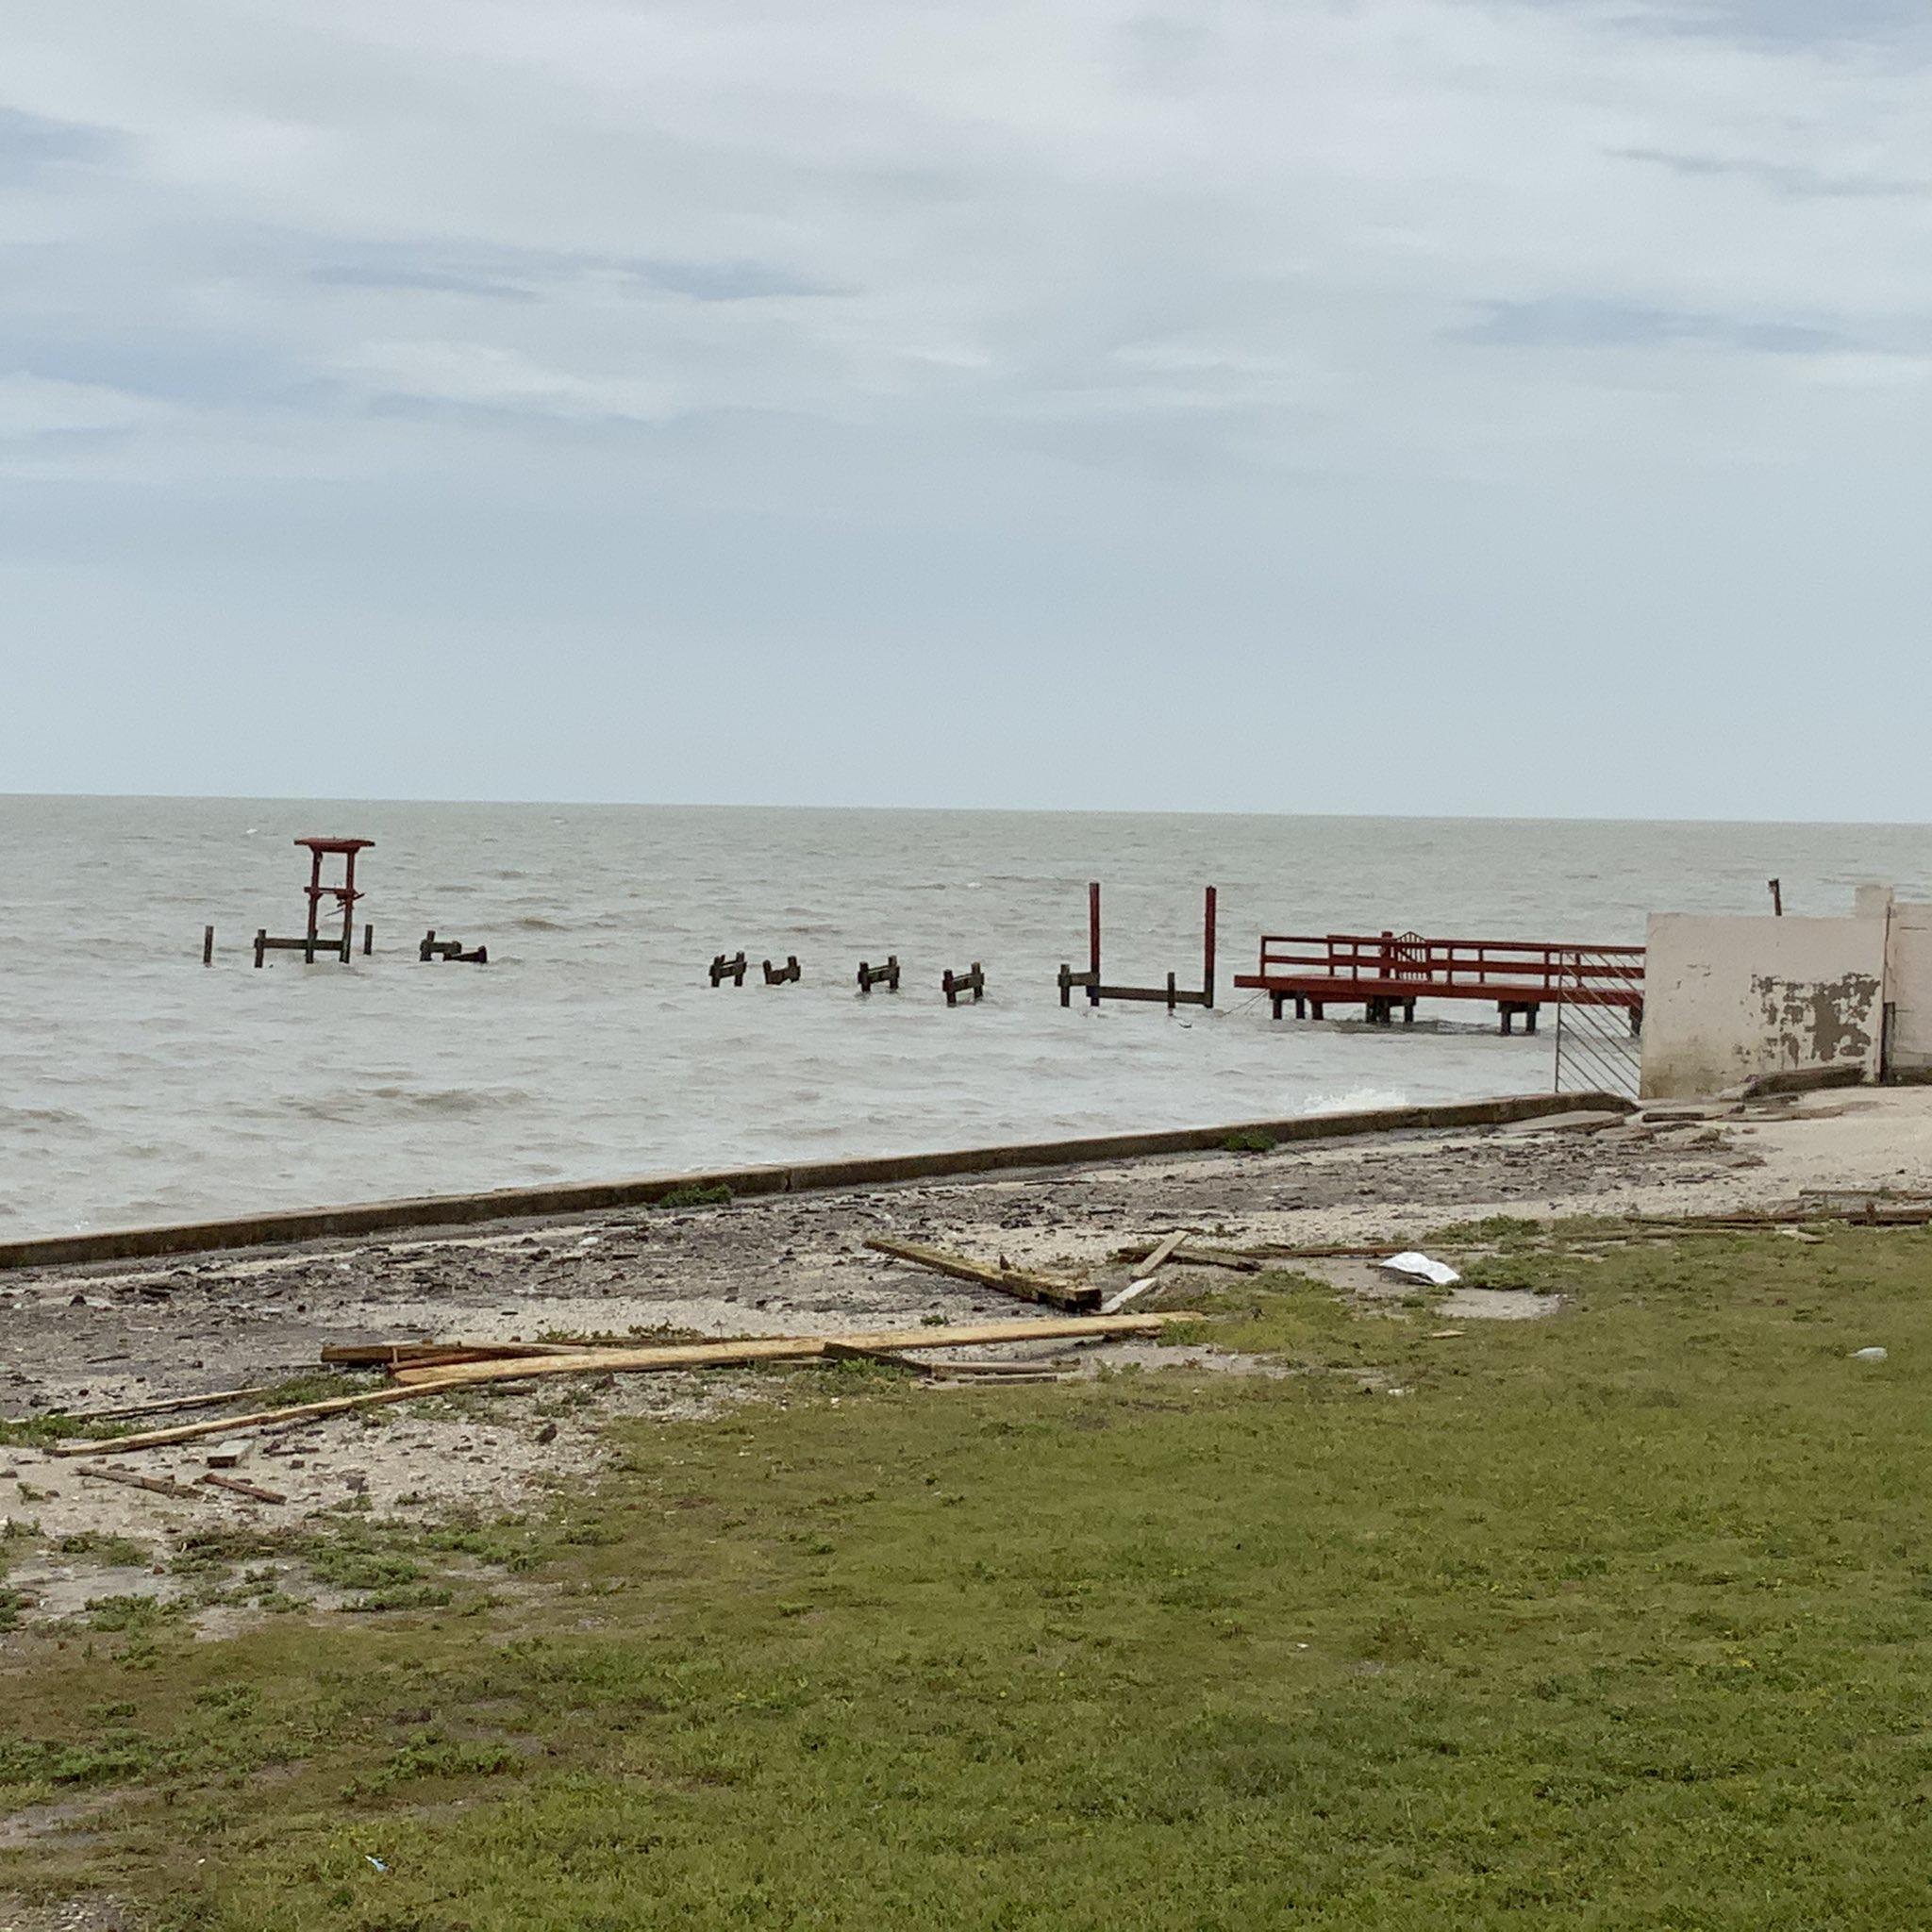 Same Pier, next day